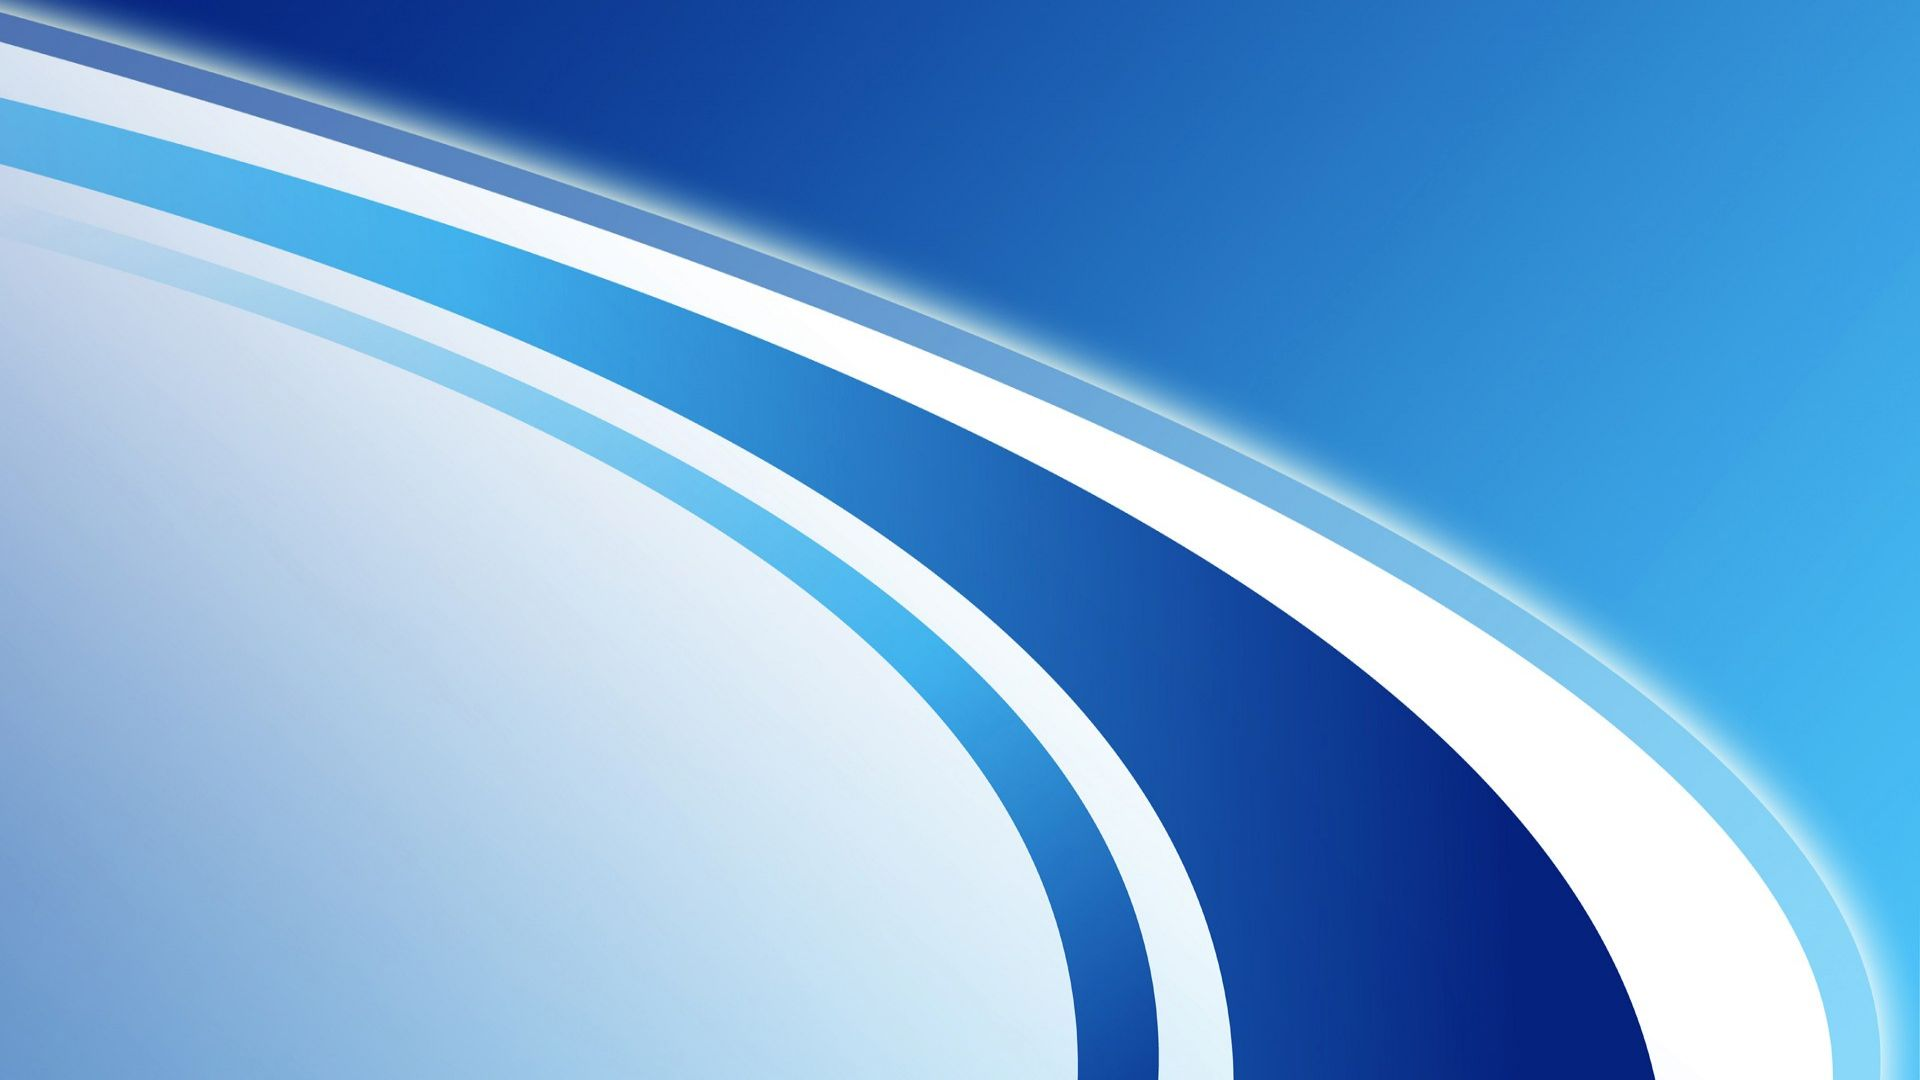 HD Blue Abstract Wallpaper - WallpaperSafari